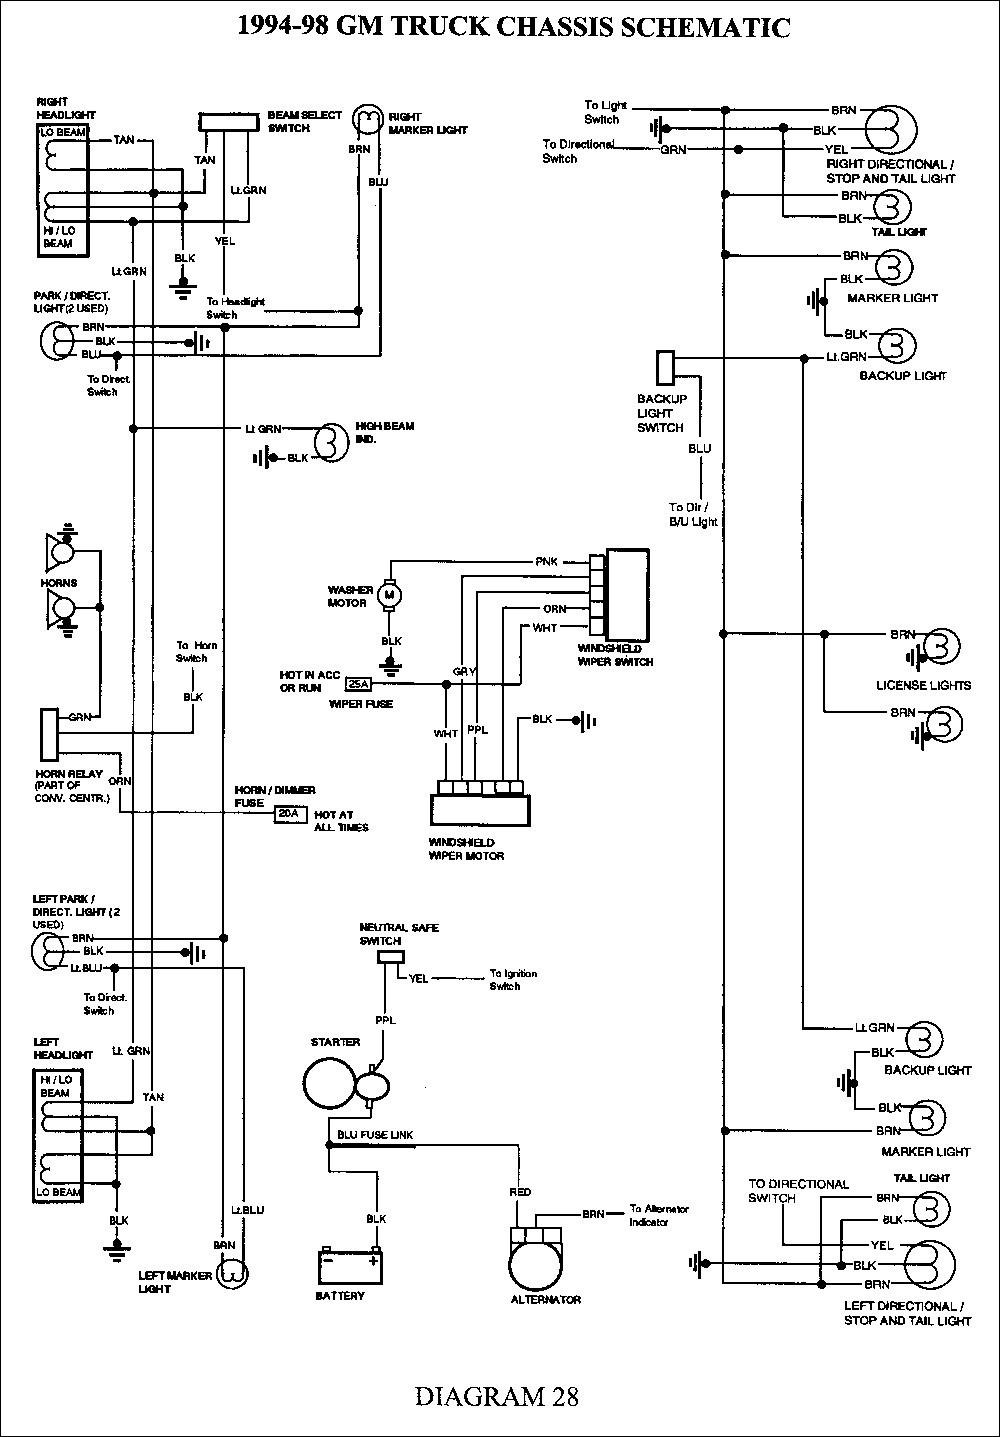 2001 Chevy Truck Alternator Wiring   Manual E-Books - 1997 Chevy Silverado Wiring Diagram